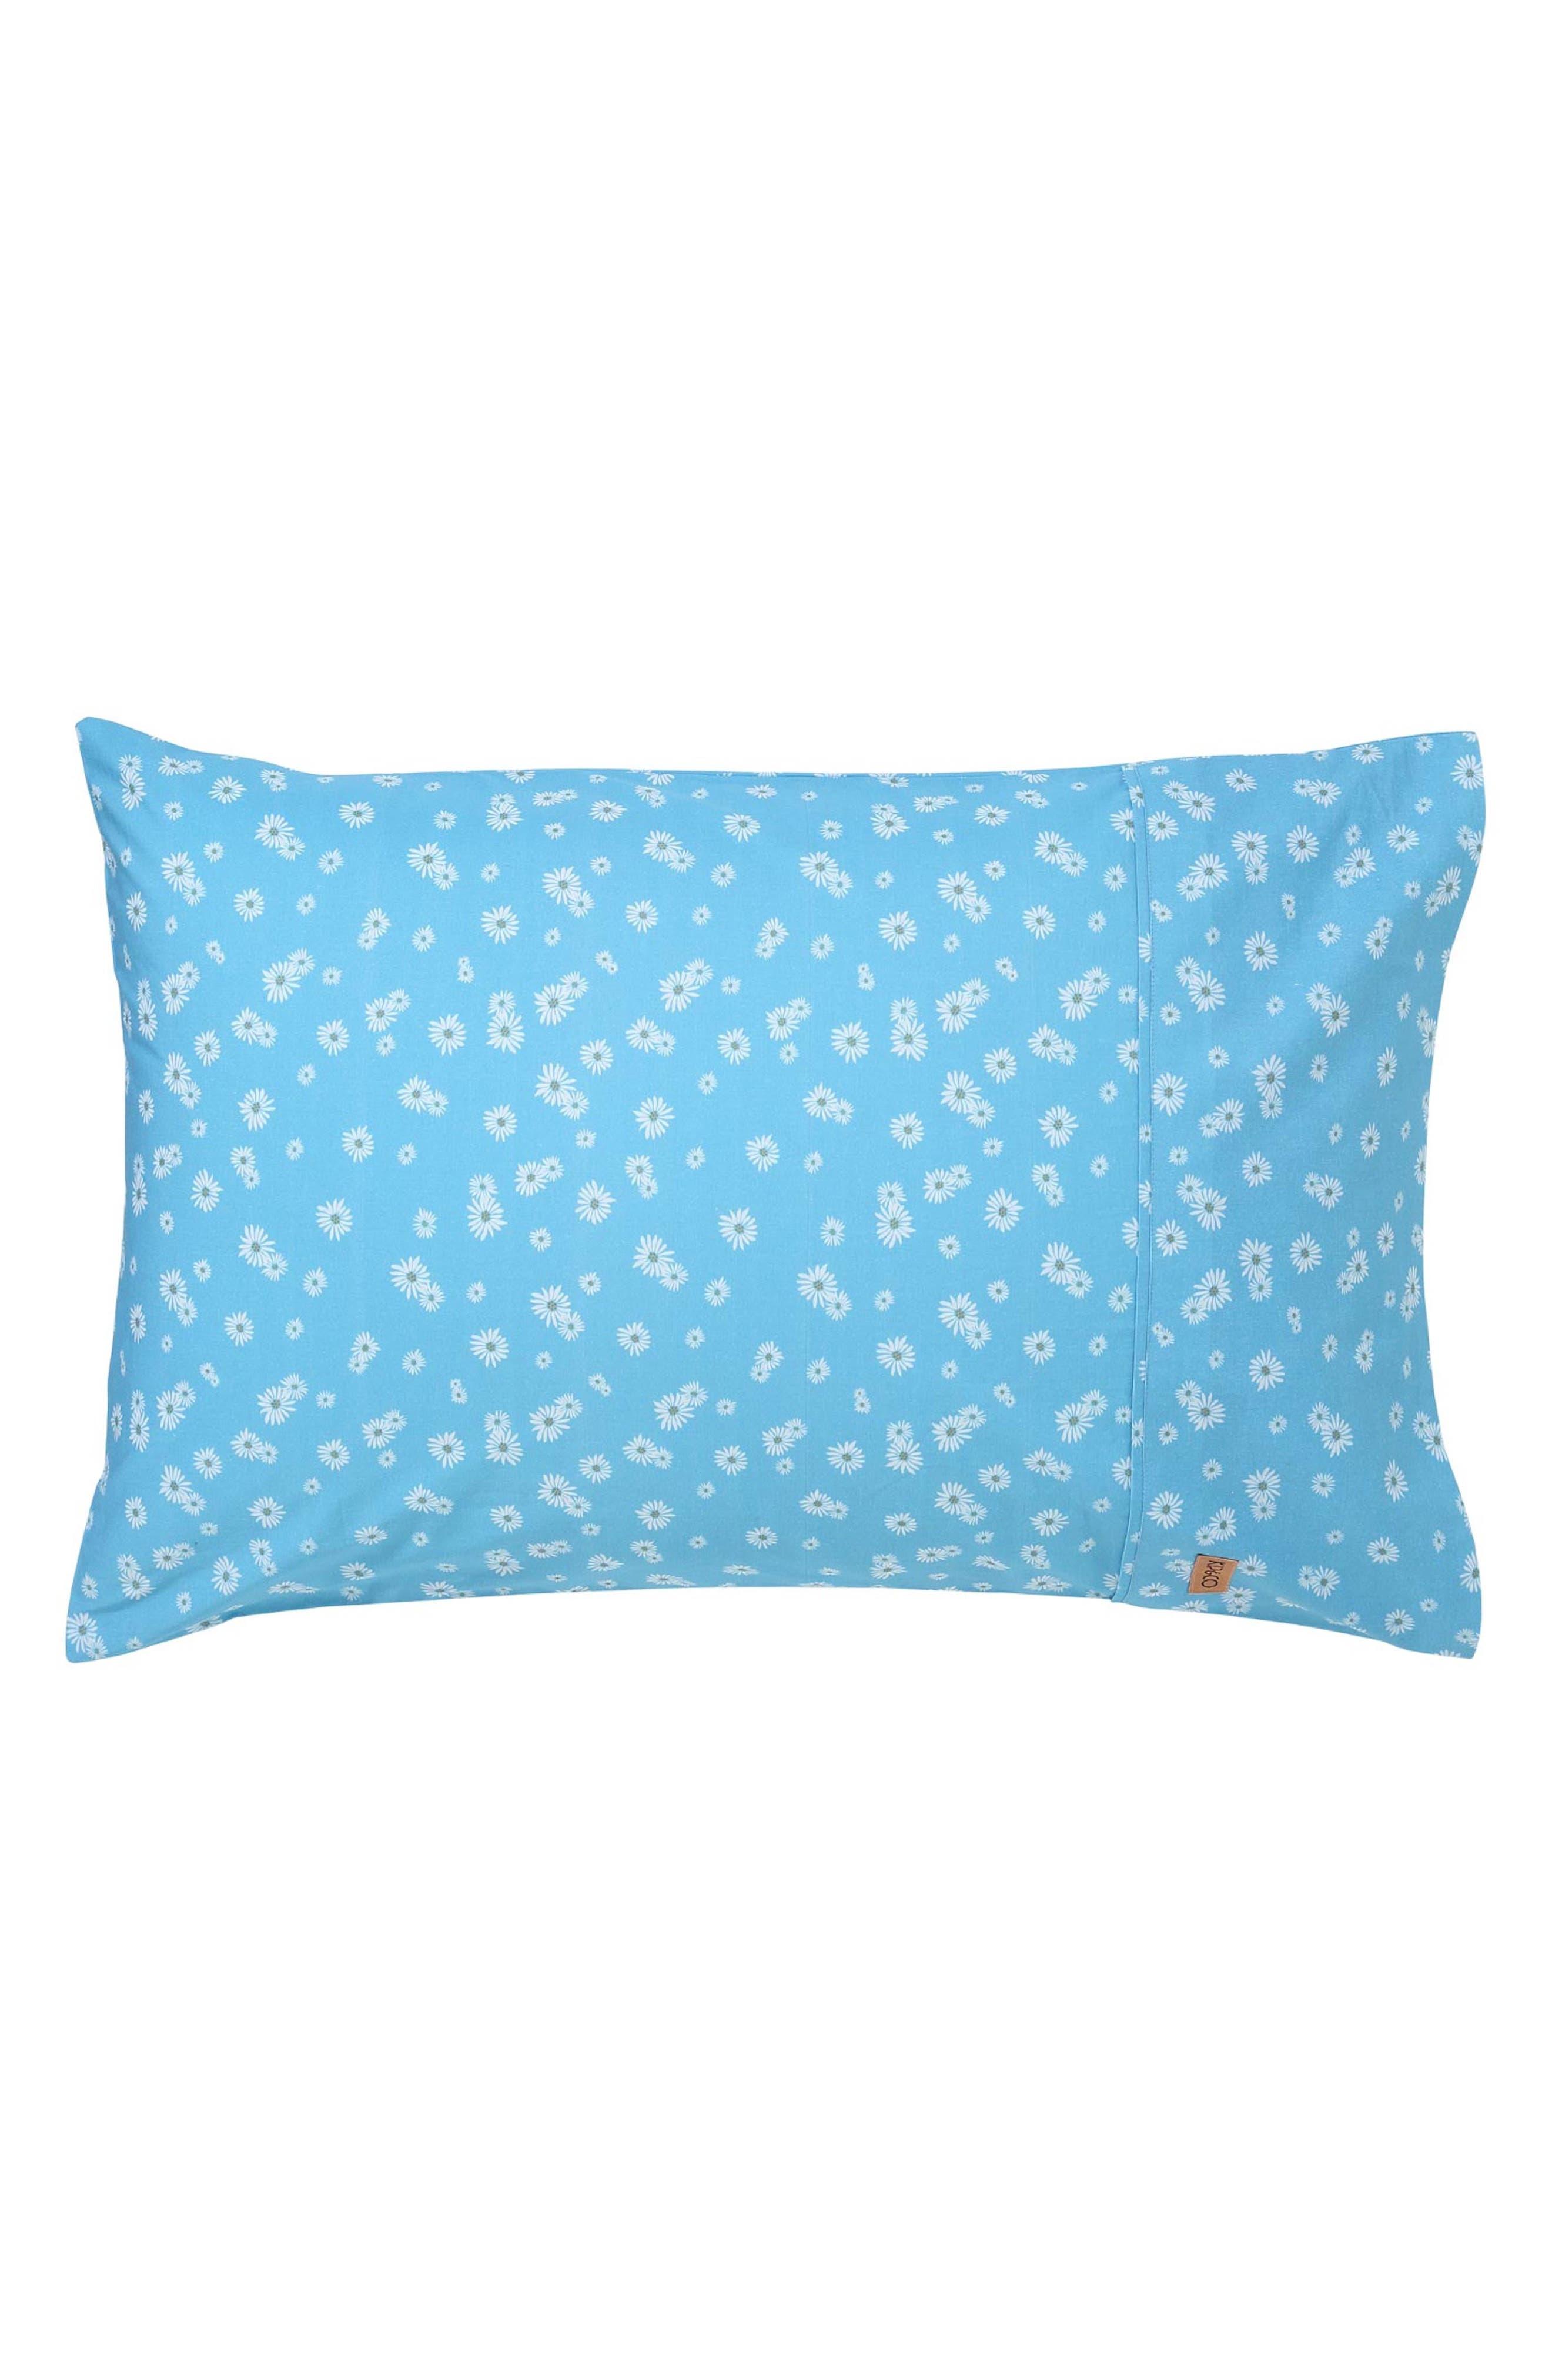 Lazy Daisy Cotton Pillowcase,                             Main thumbnail 1, color,                             Multi